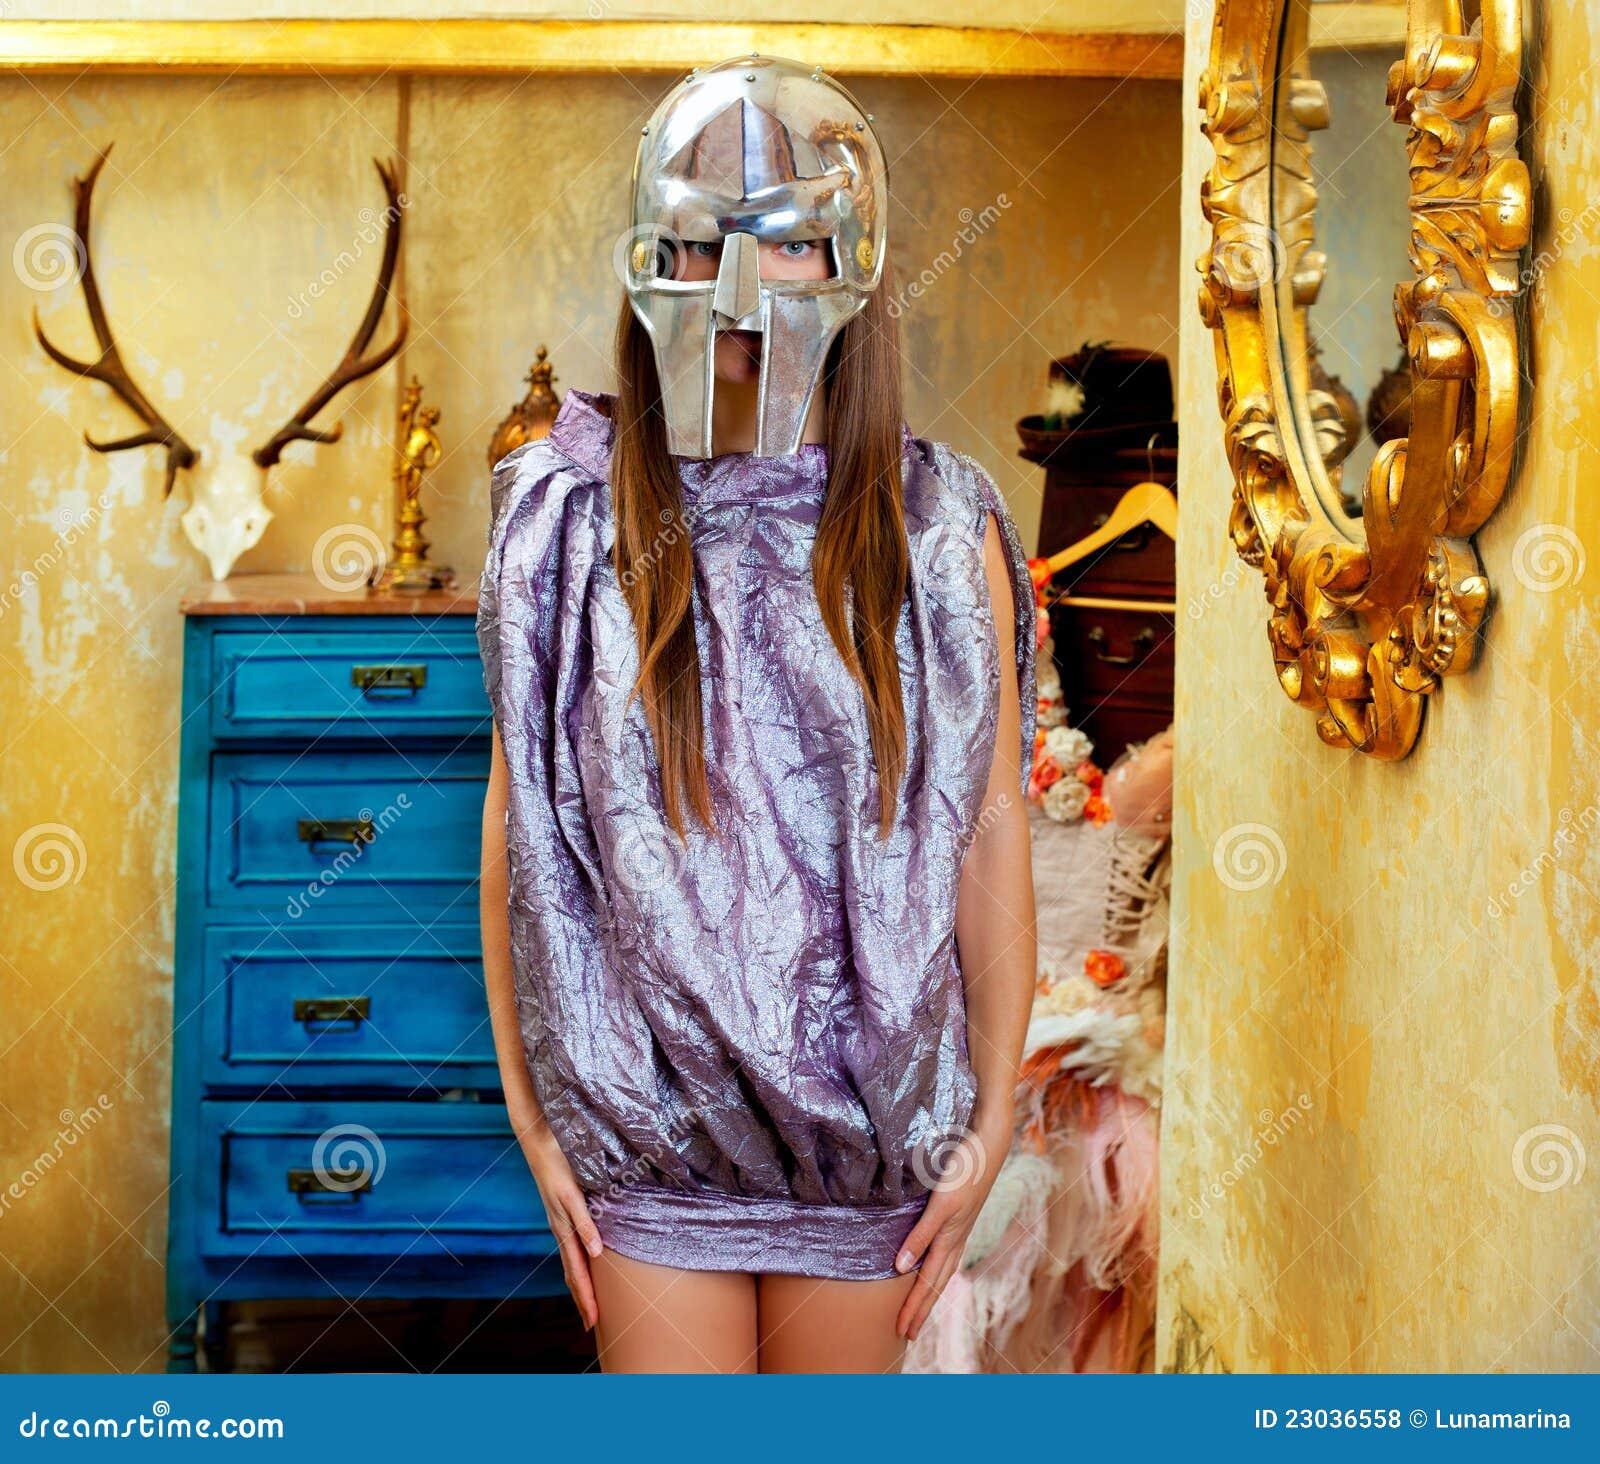 futuristic fashion in retro grunge home royalty free